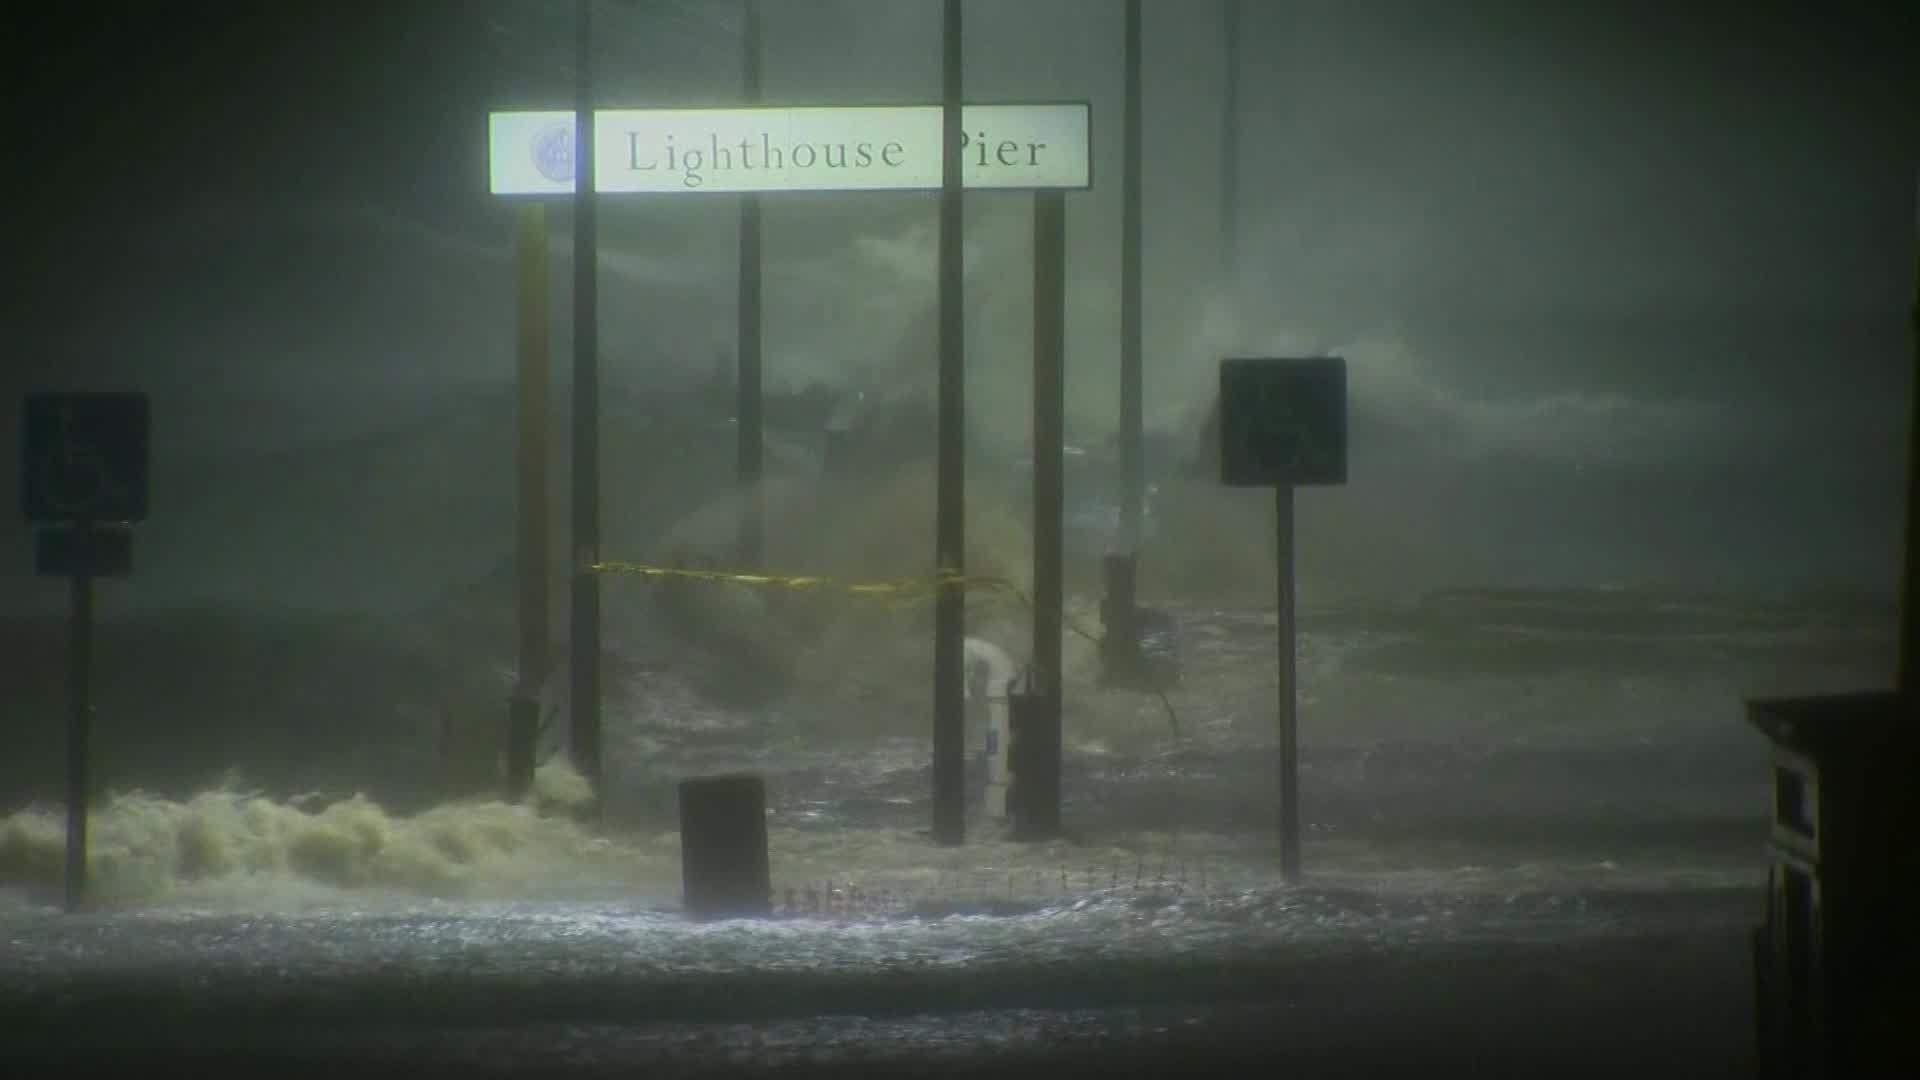 storm surge in biloxi at lighthouse pier_321541